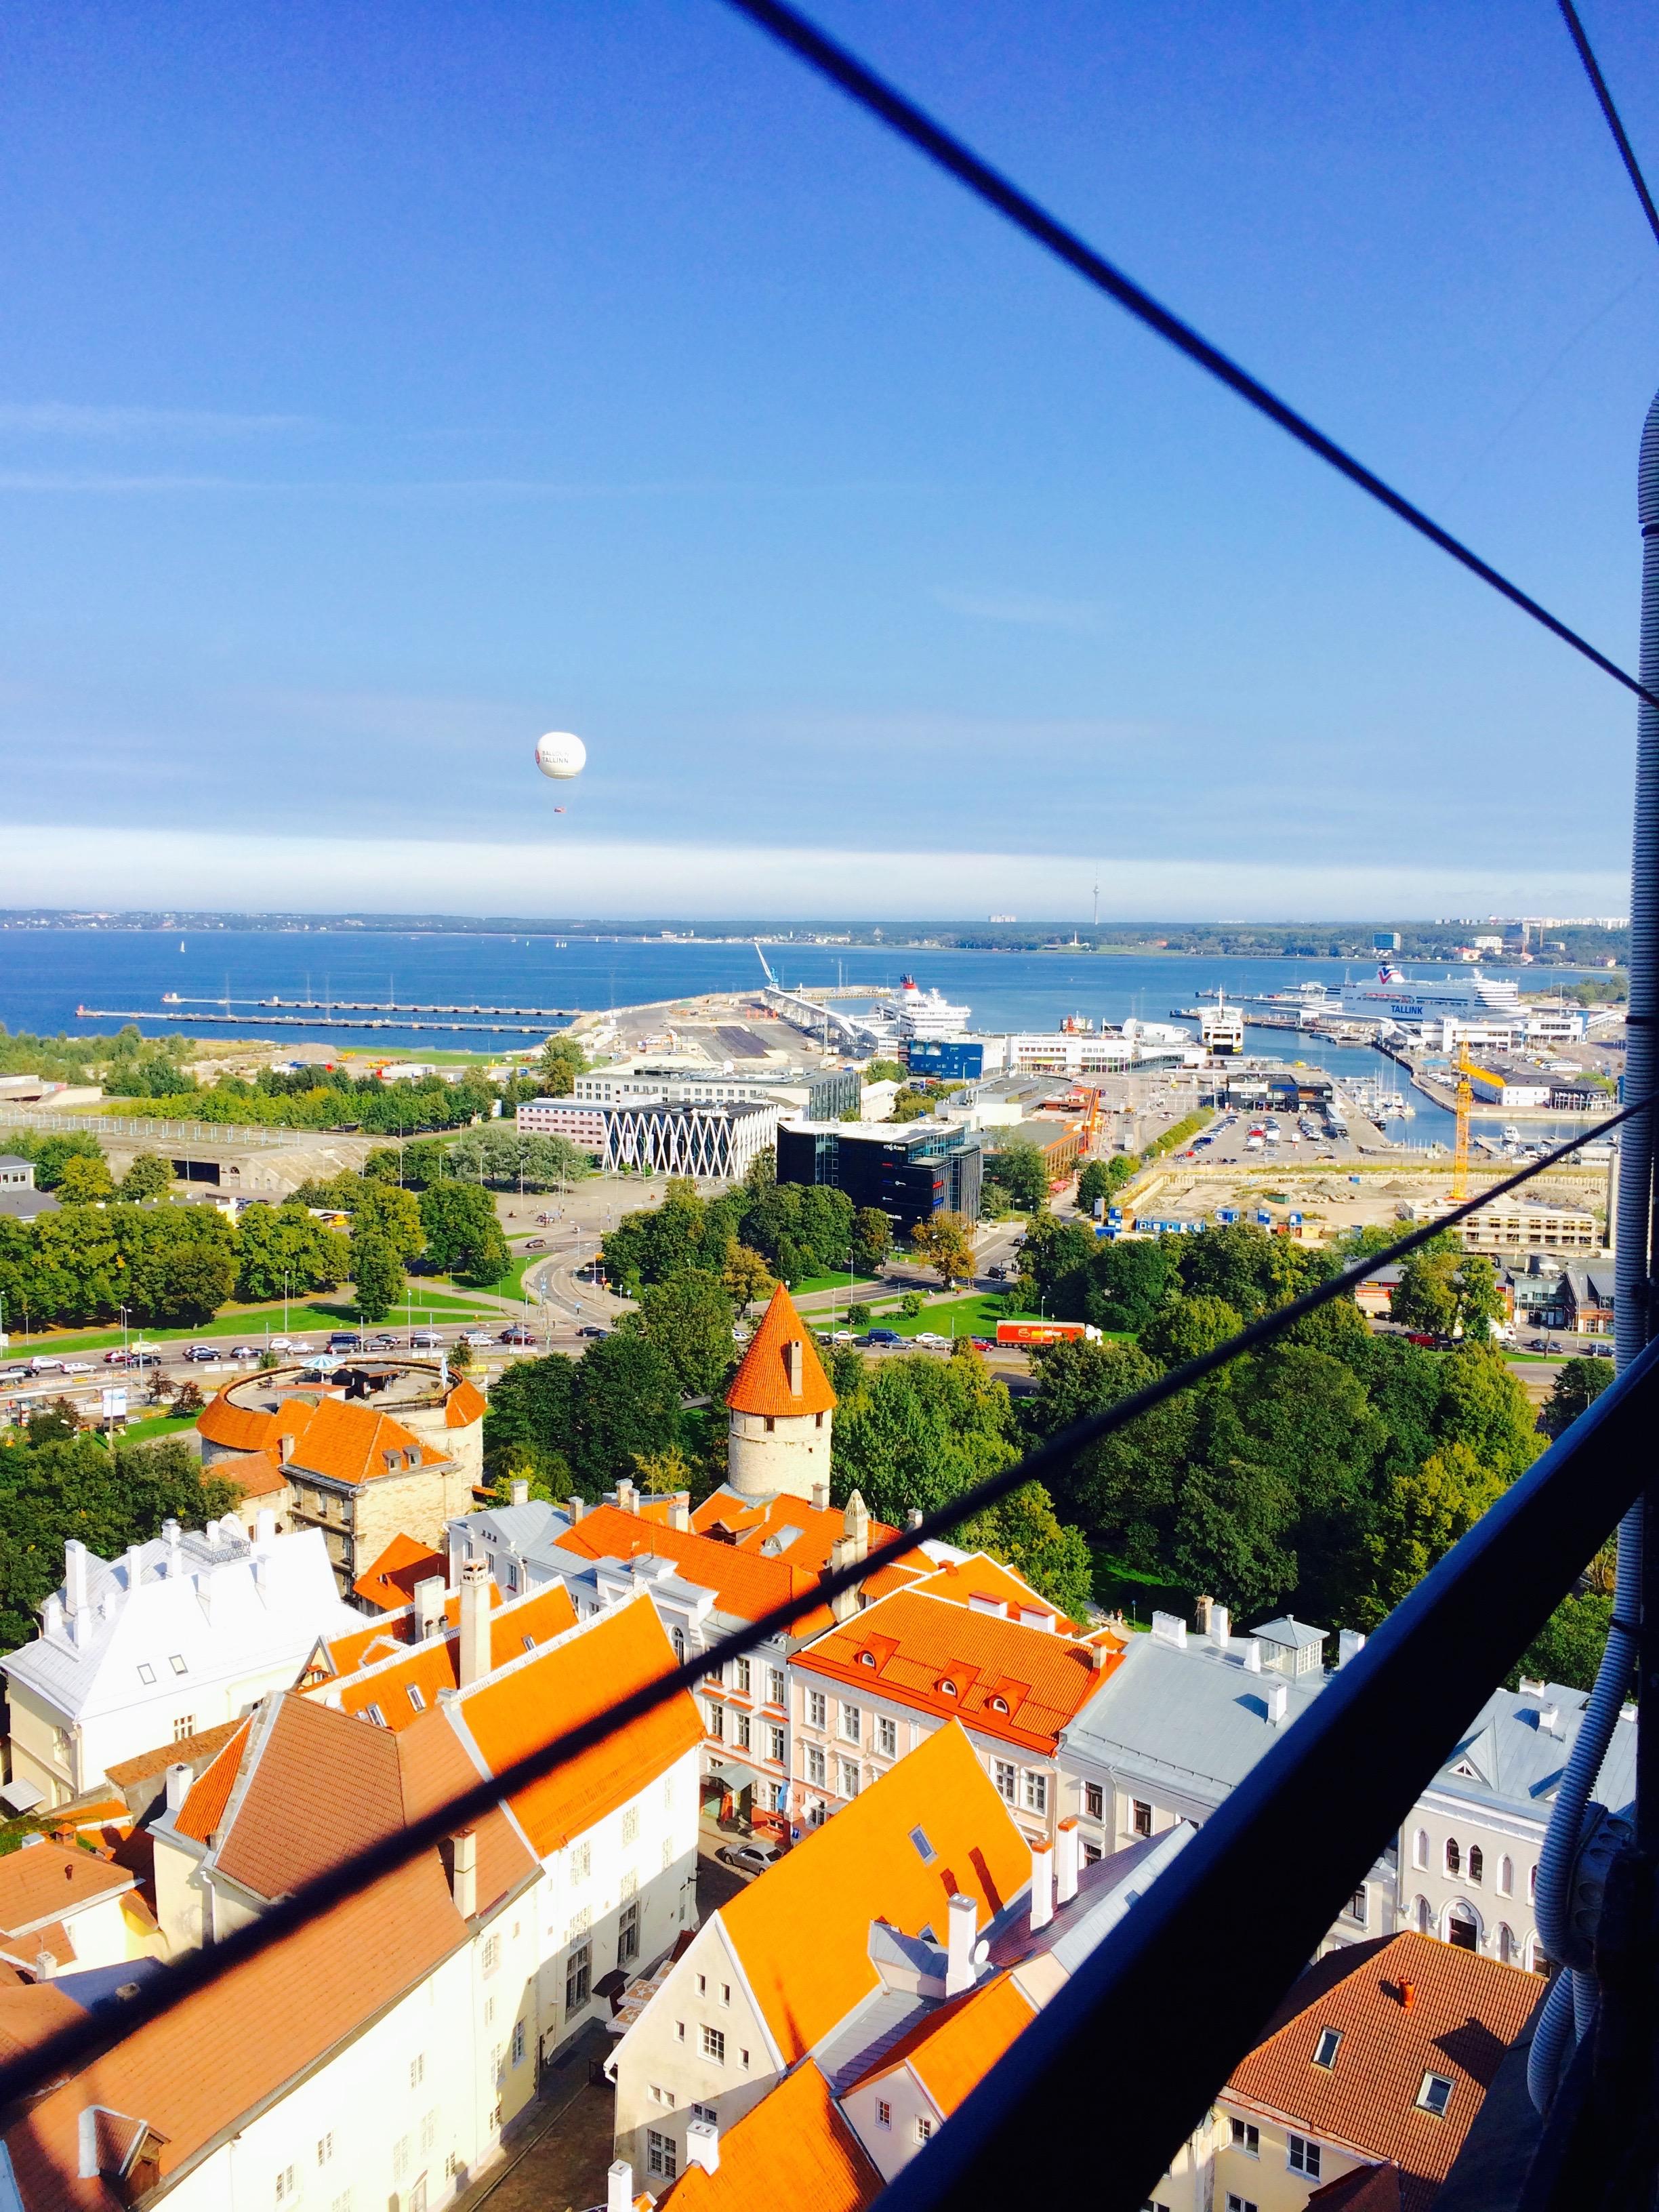 View from St. Olaf's Church in Tallinn, Estonia